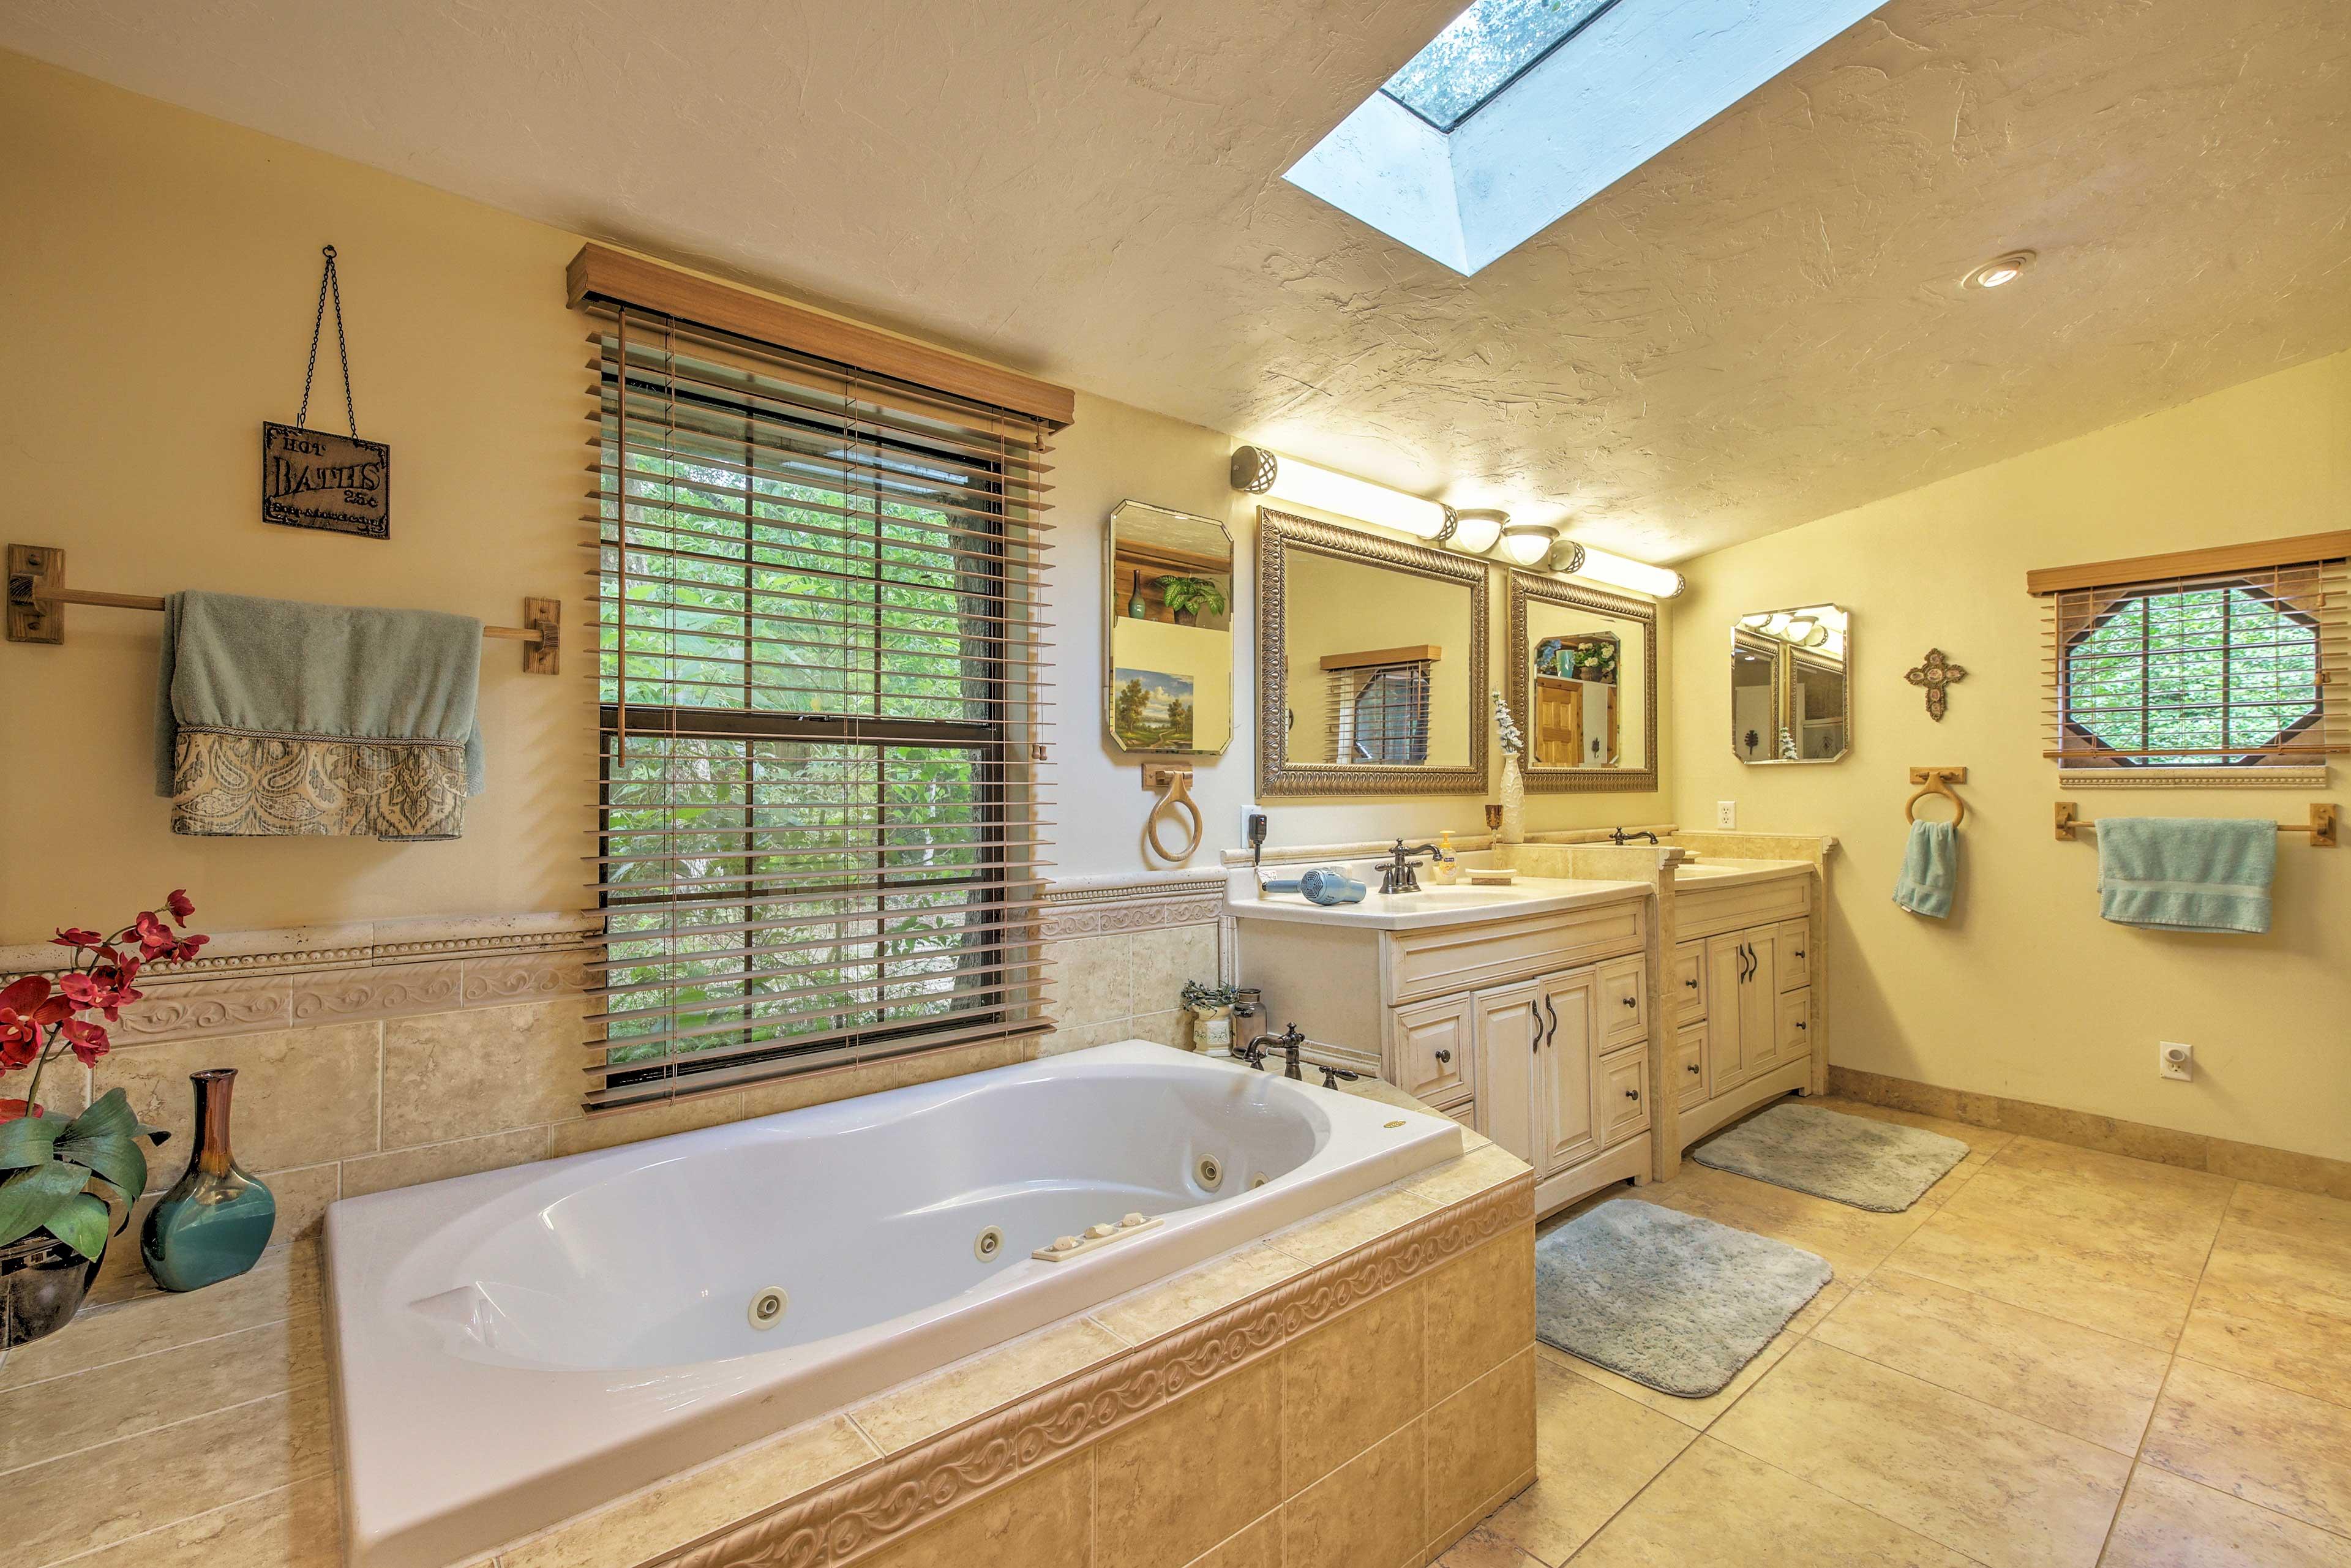 Enjoy a relaxing soak in the jacuzzi bathtub.